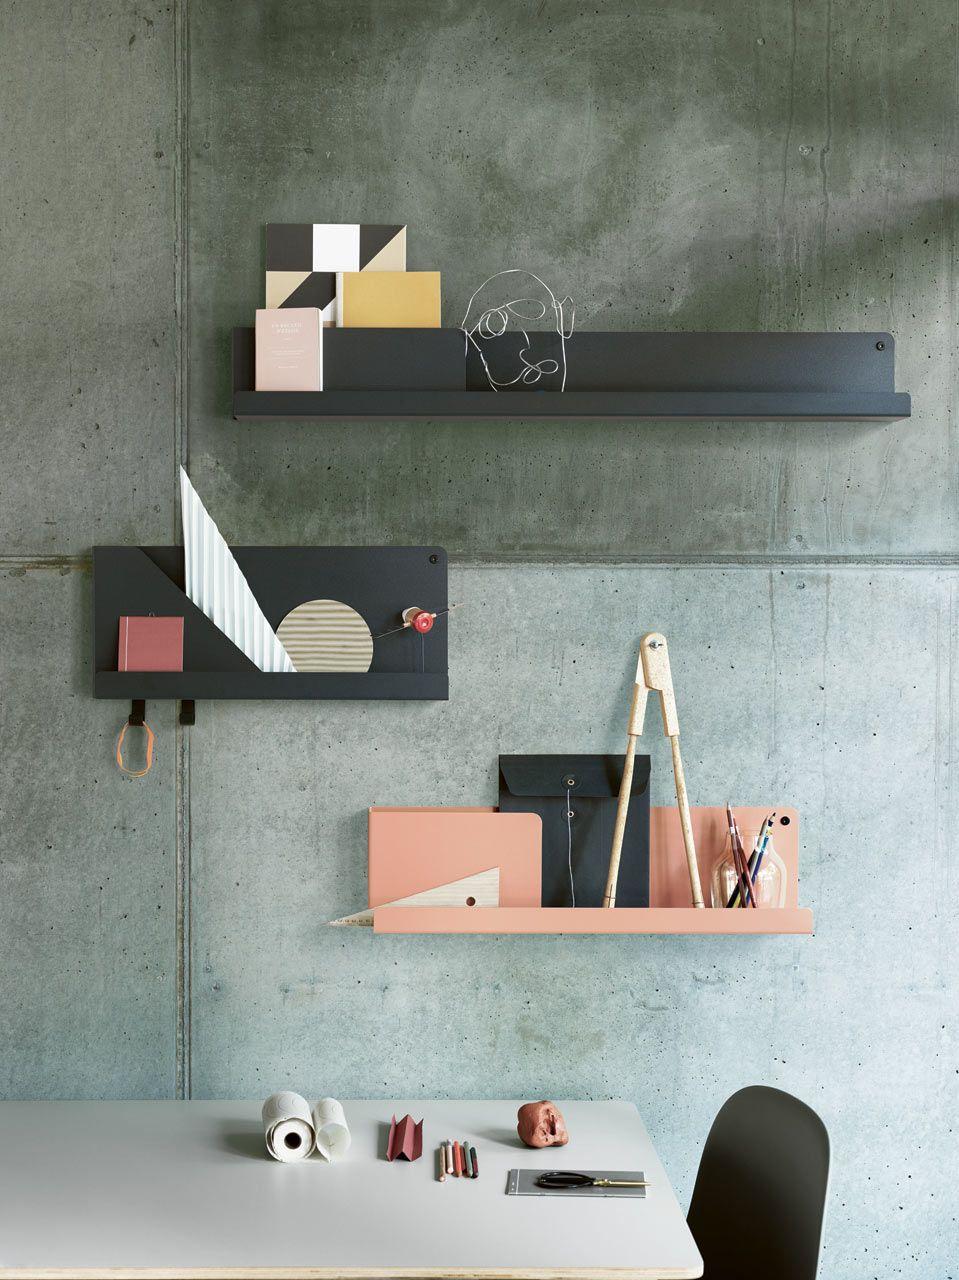 Wall Storage System To Organize Display Items Wall Storage Systems Shelves Scandinavian Design